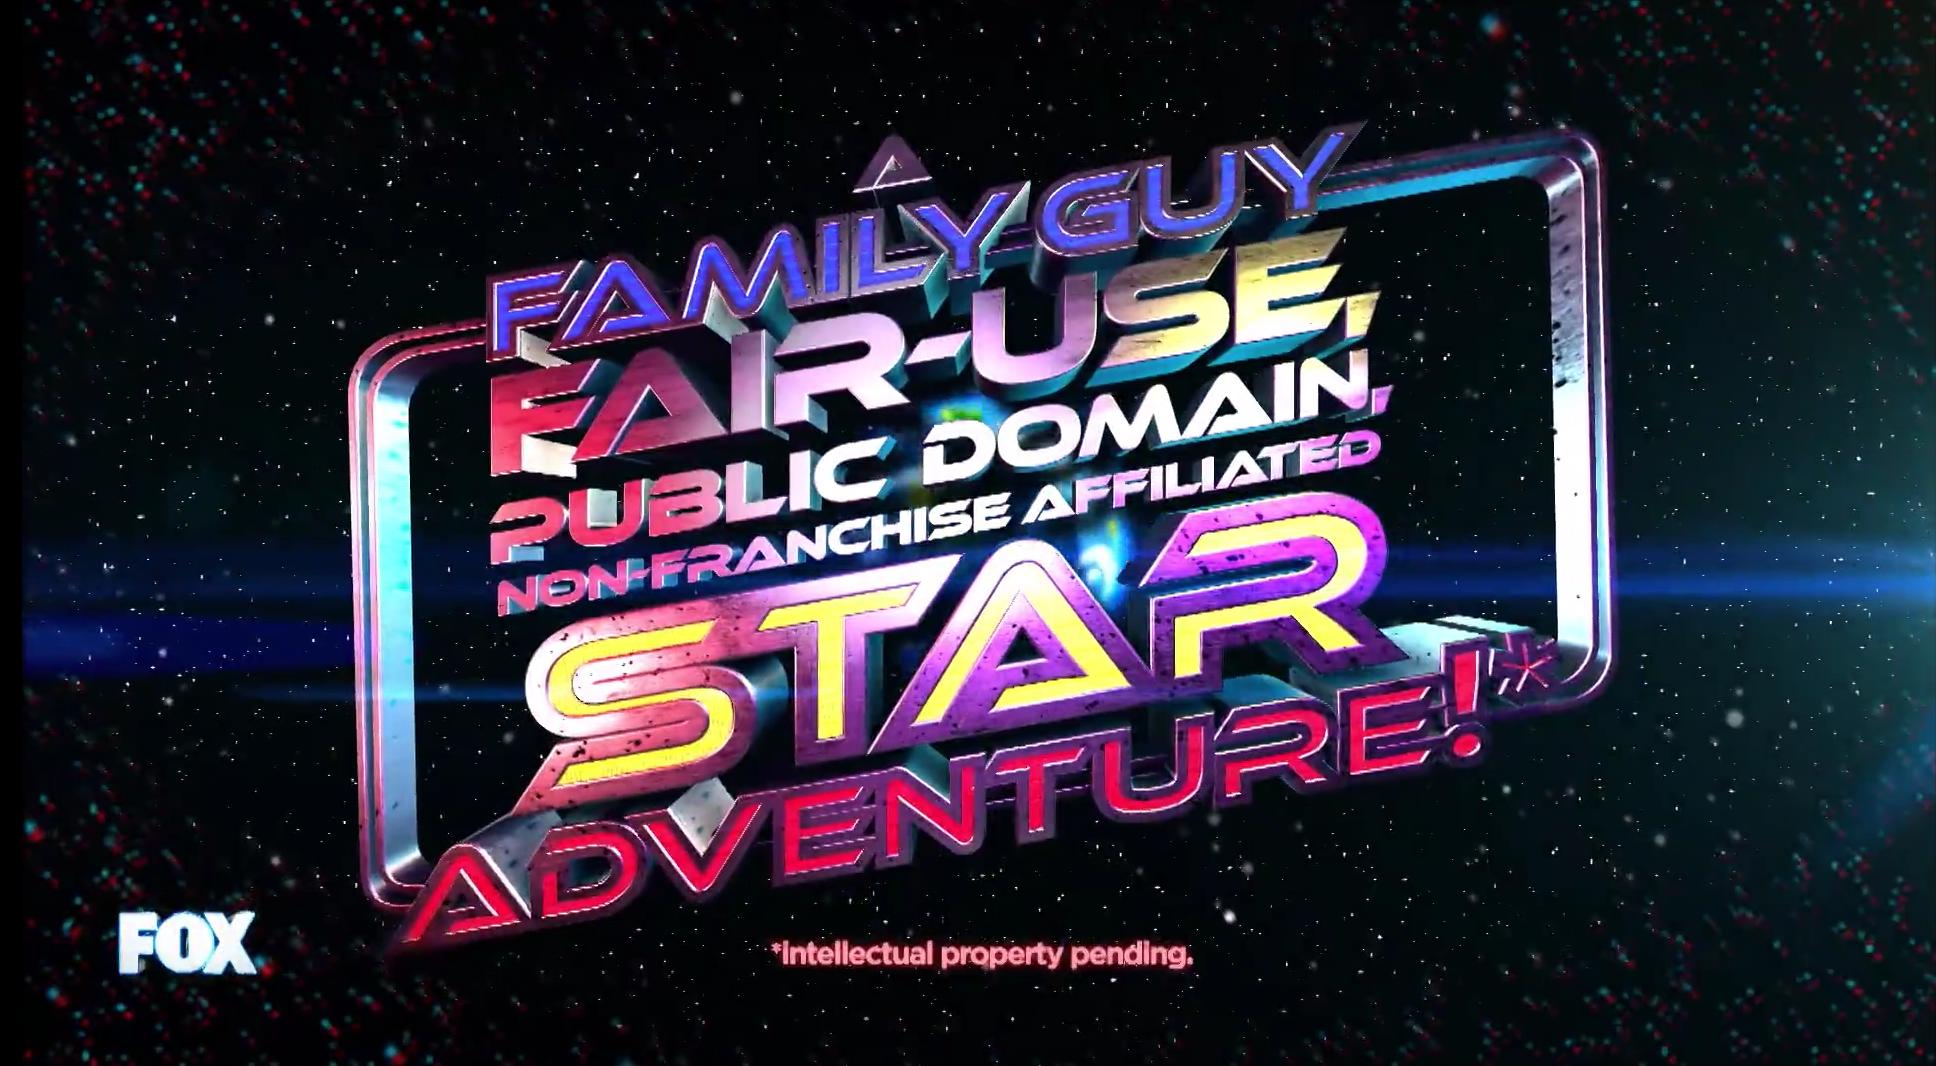 Family Guy Star Adventure